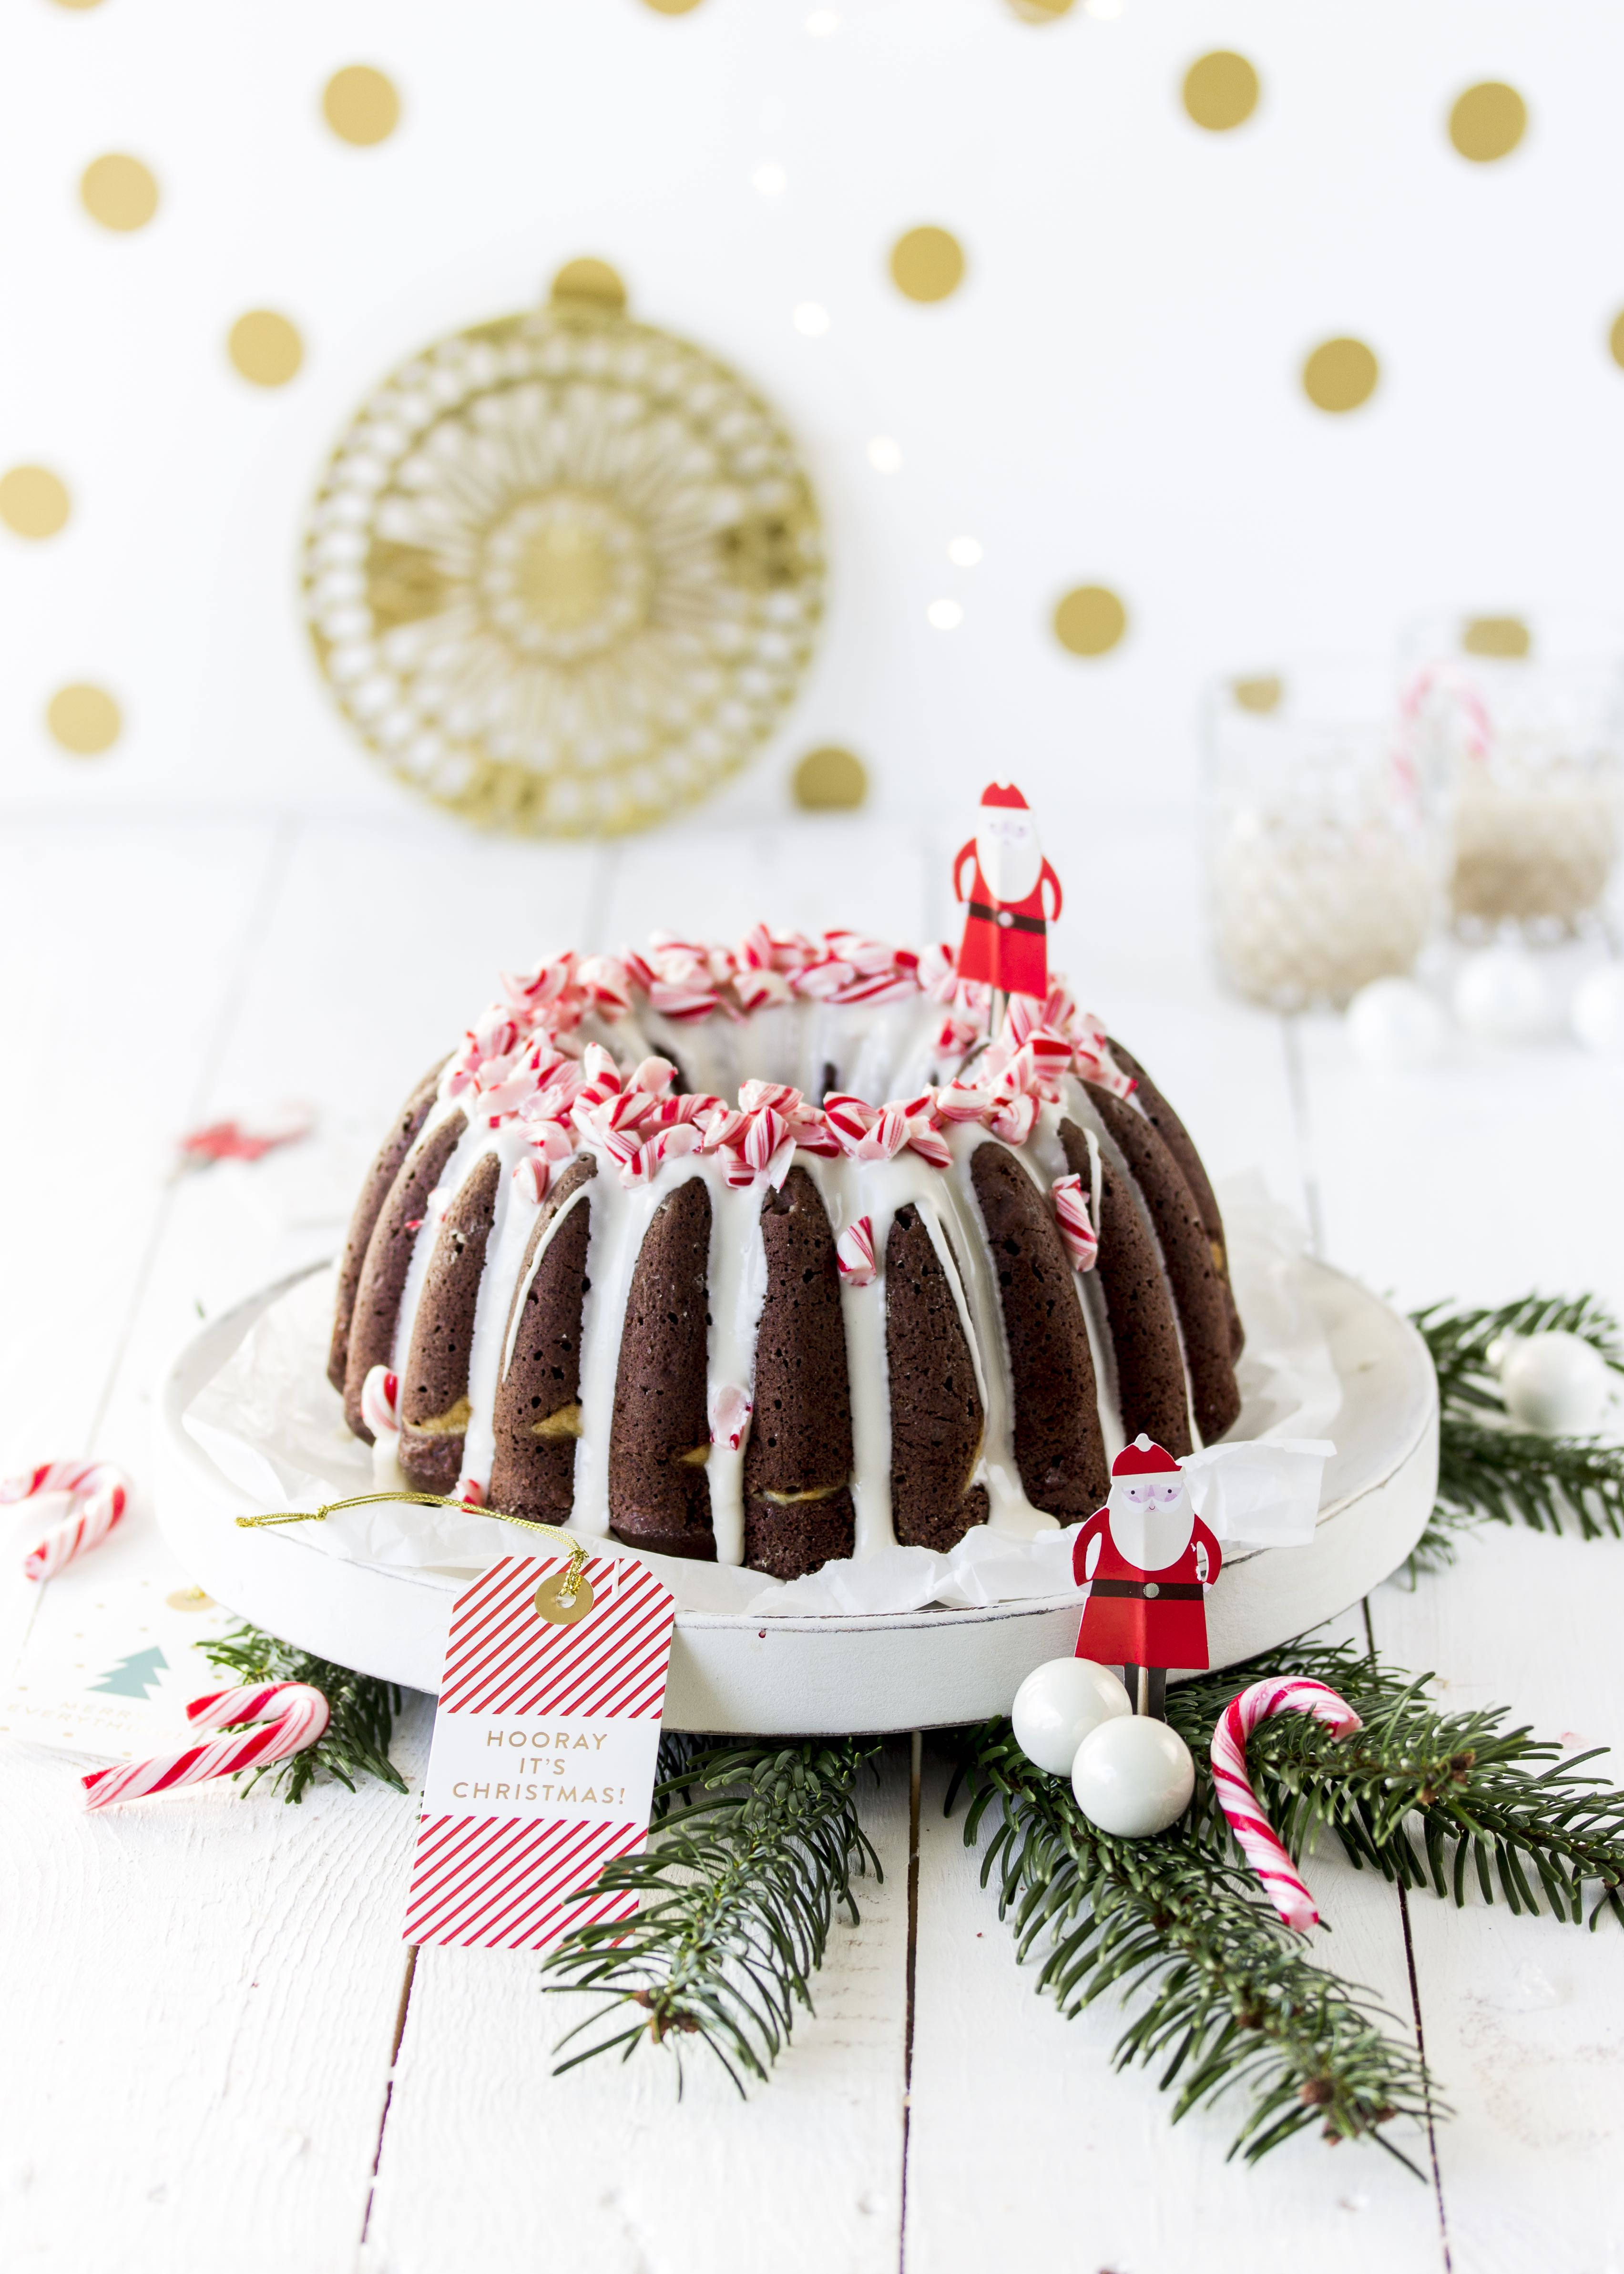 Rezept Irish Cream Liqueur Weihnachten Gugelhupf Rührkuchen Kuchen Käsekuchen Cream Cheese